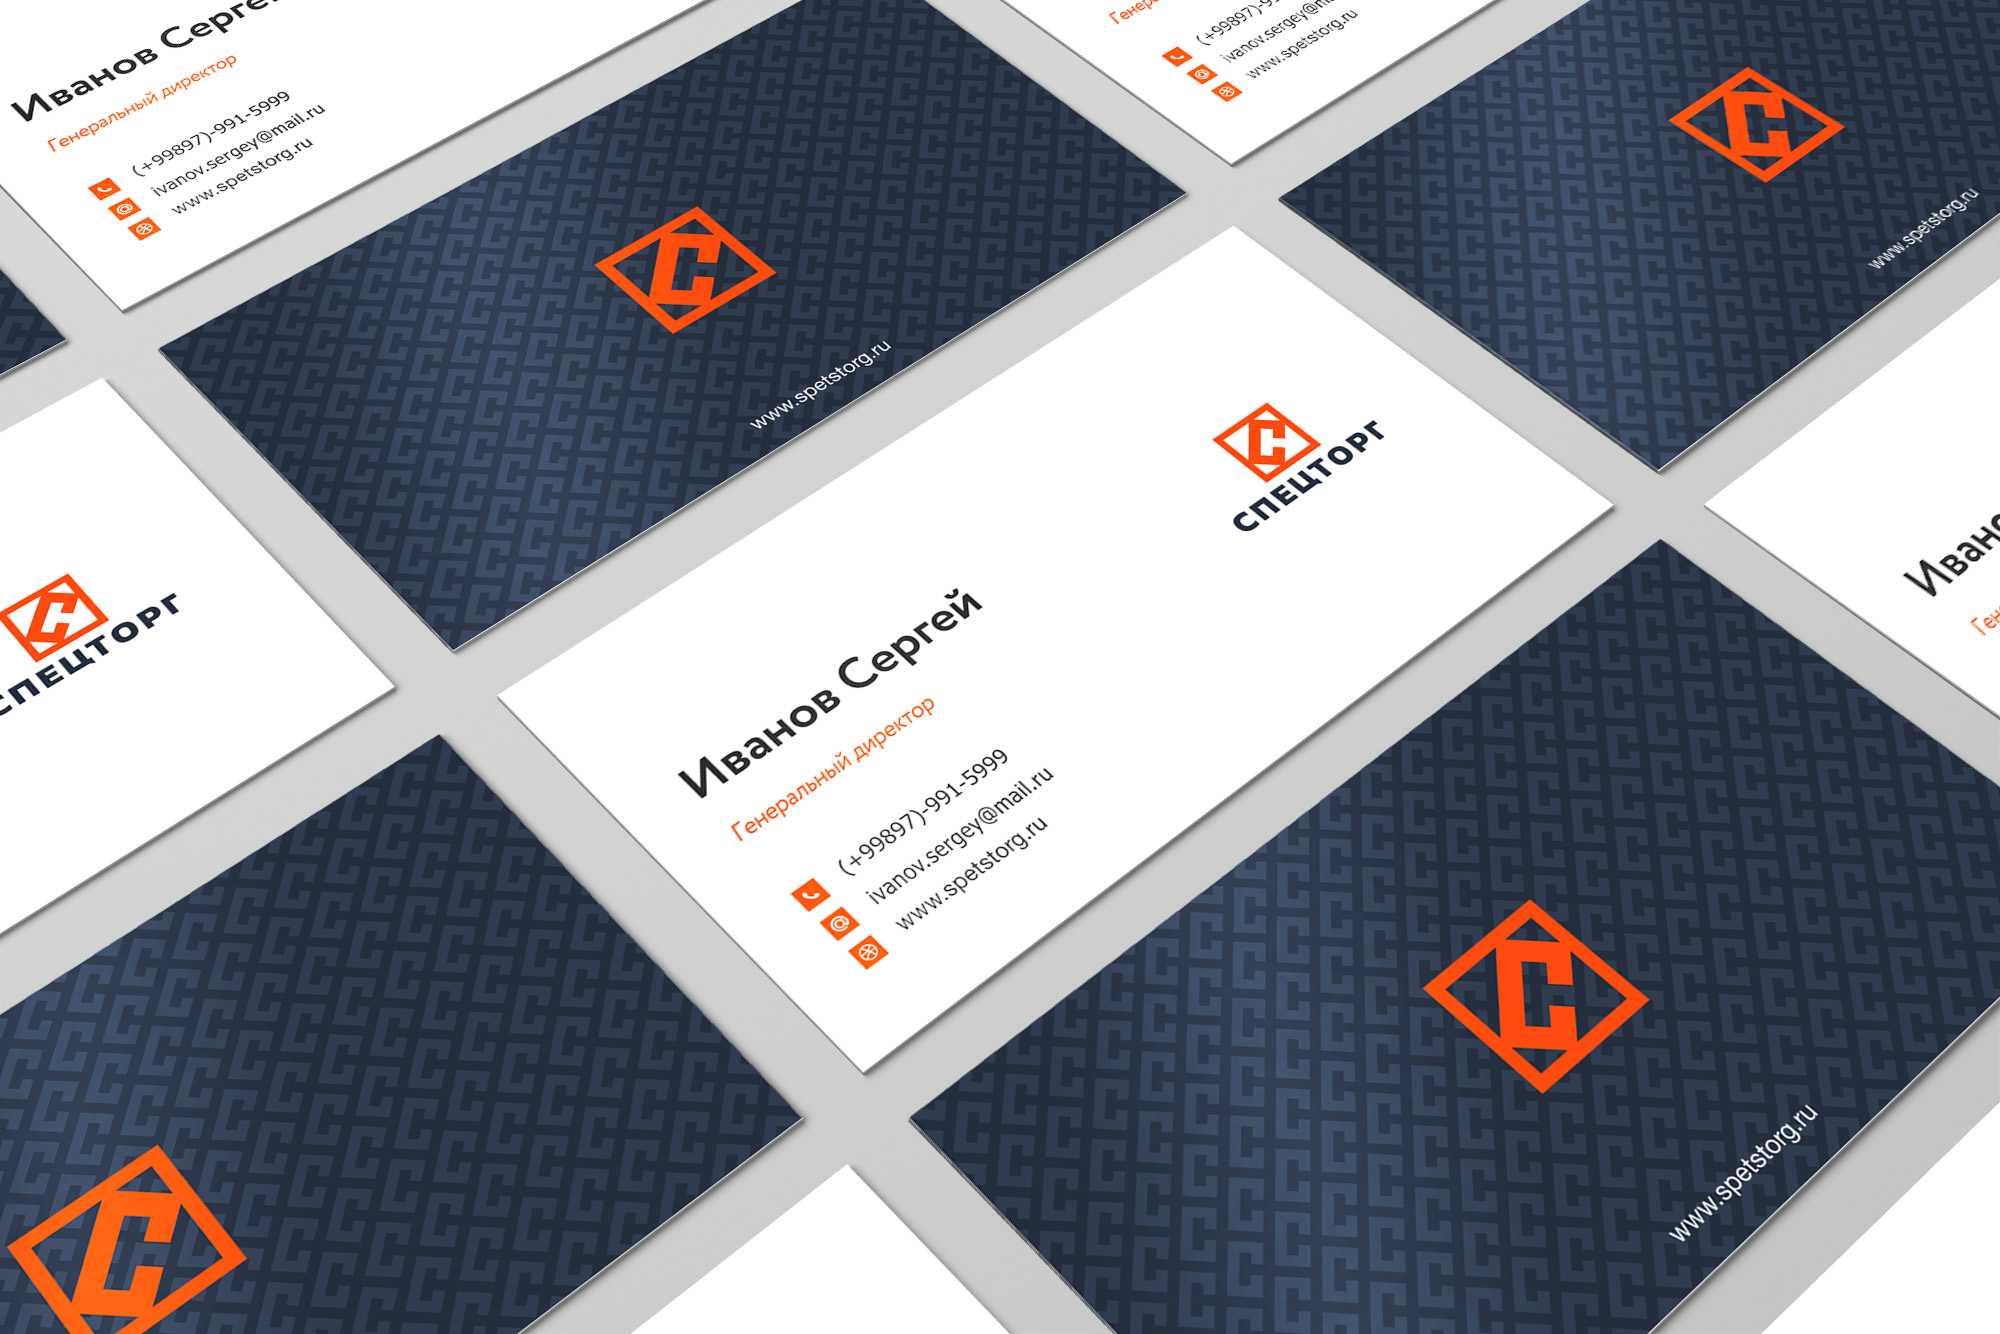 Разработать дизайн  логотипа компании фото f_4985dc8f39e2ceb6.jpg